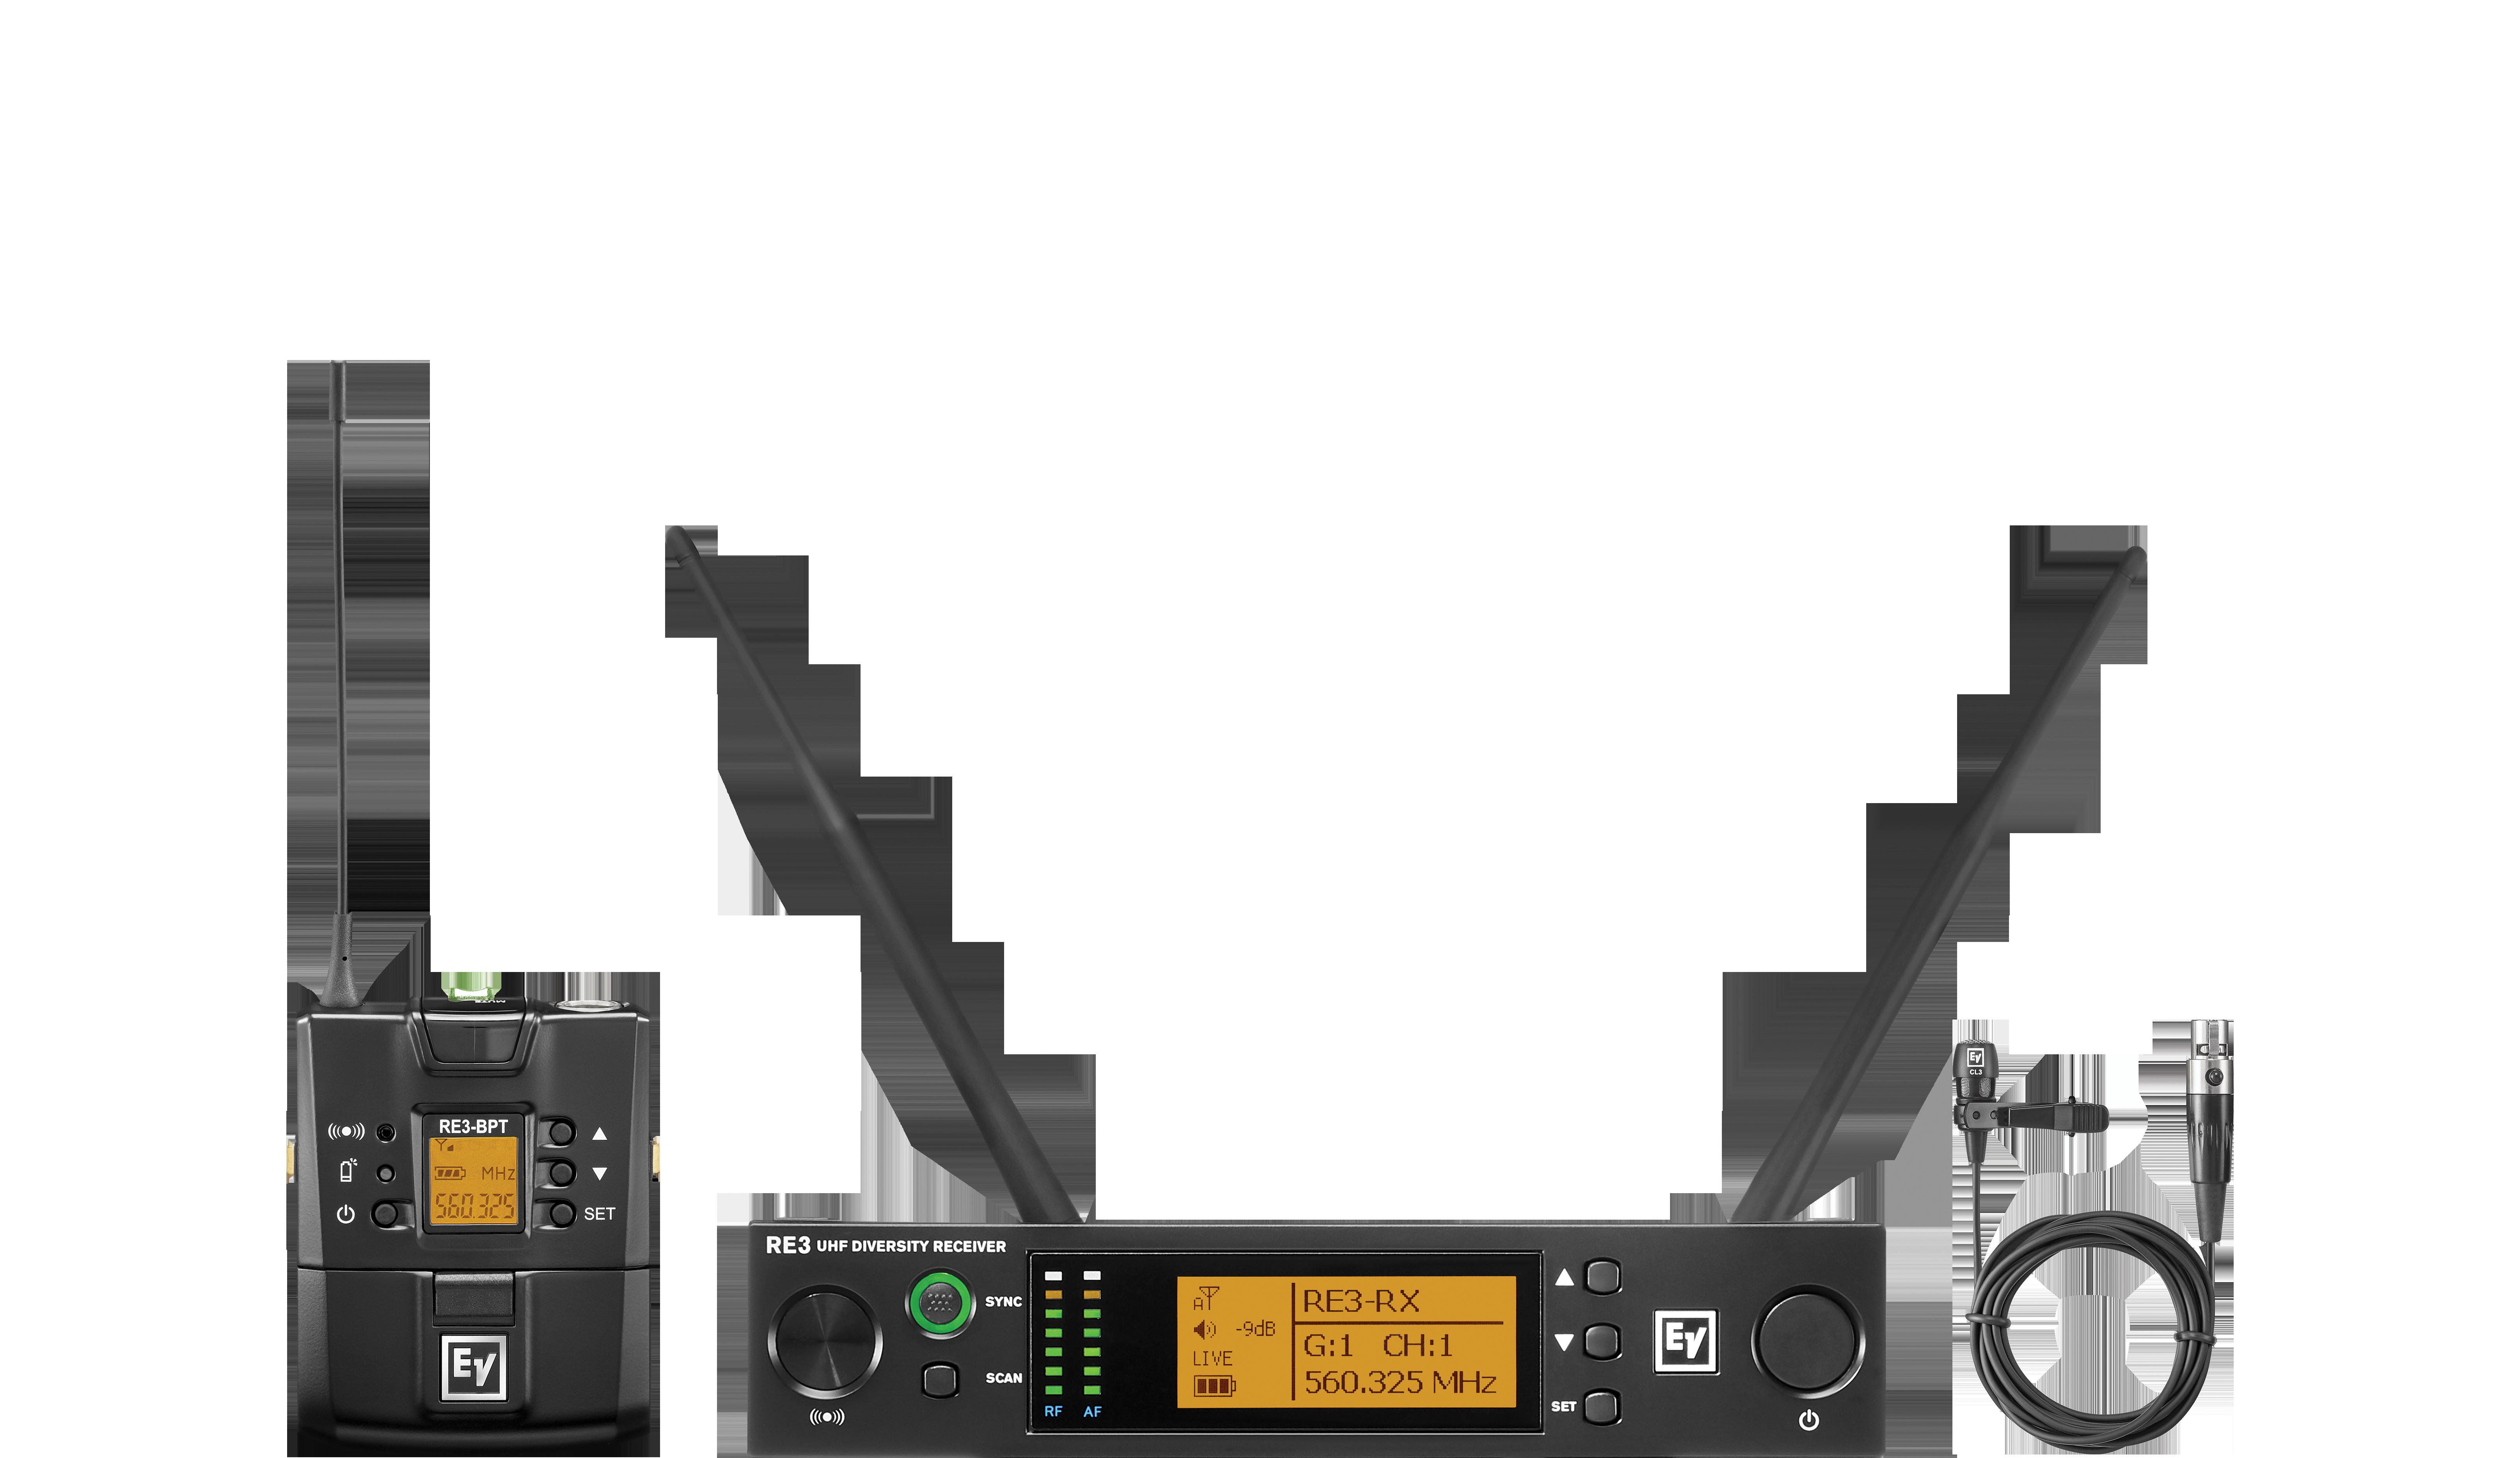 RE3-BPCL-8M - Sistem wireless [1]